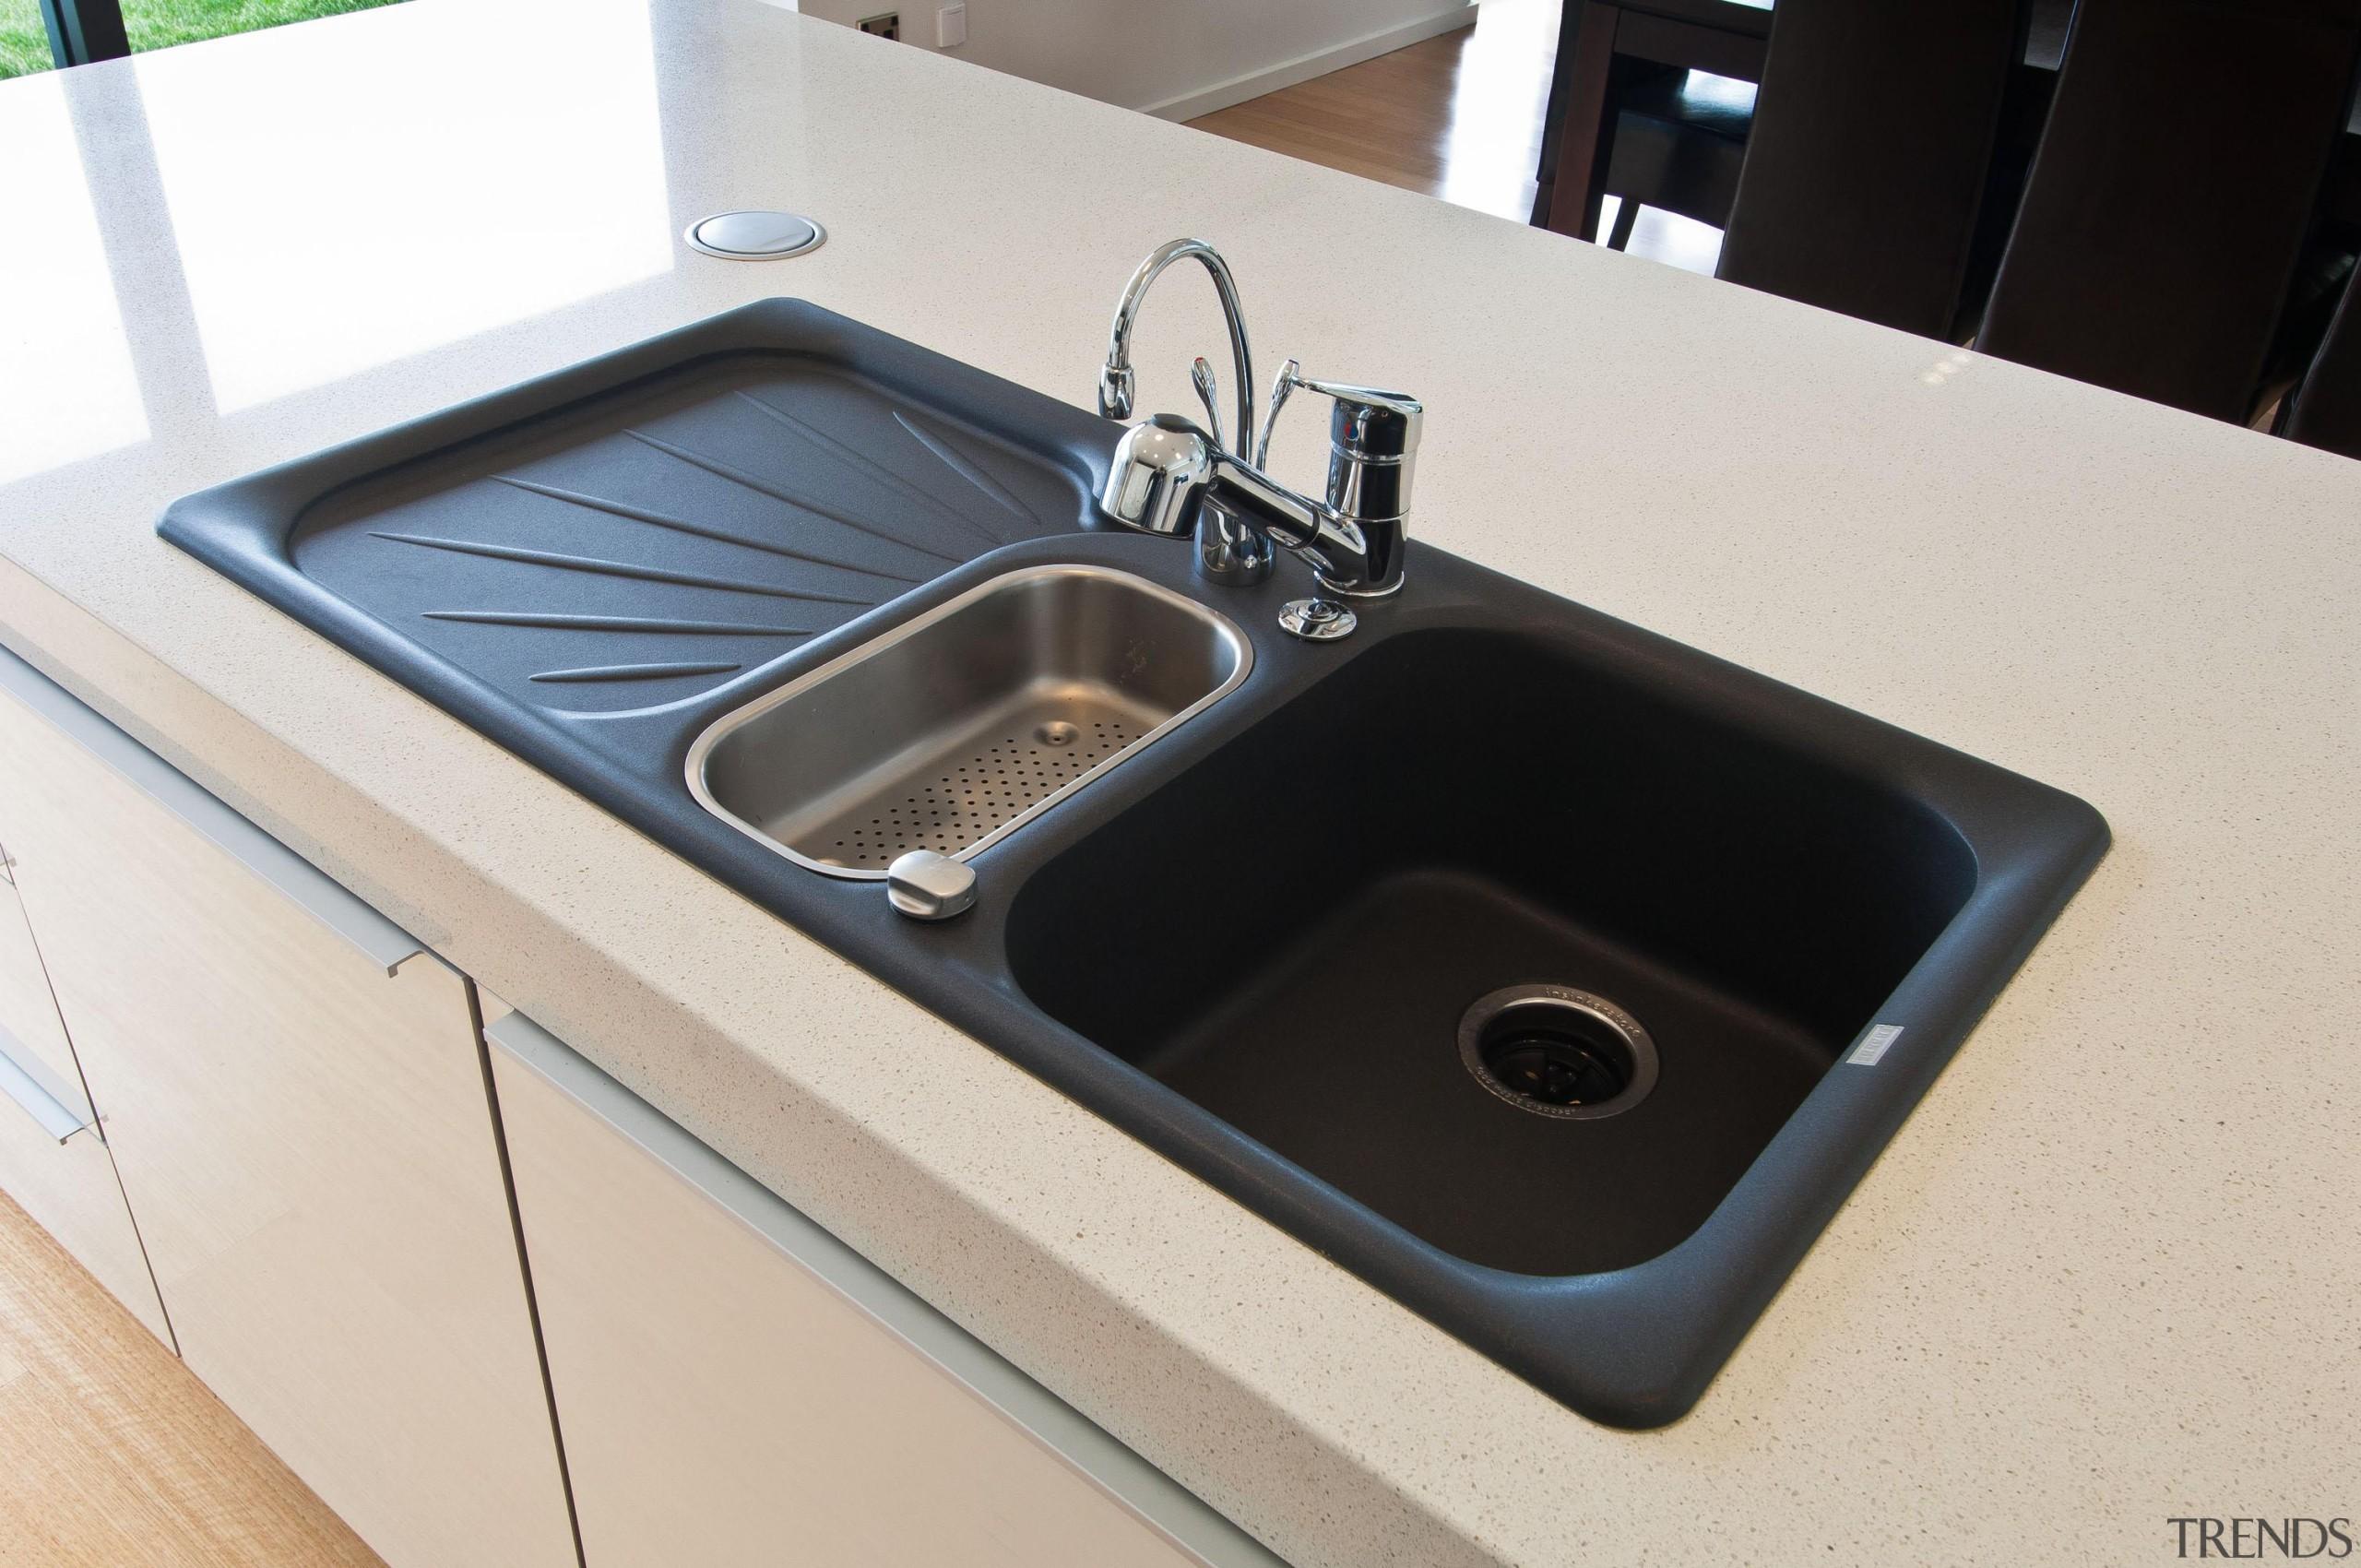 Khandallah Kitchen - Khandallah Kitchen - bathroom sink bathroom sink, countertop, hardware, plumbing fixture, product design, sink, white, black